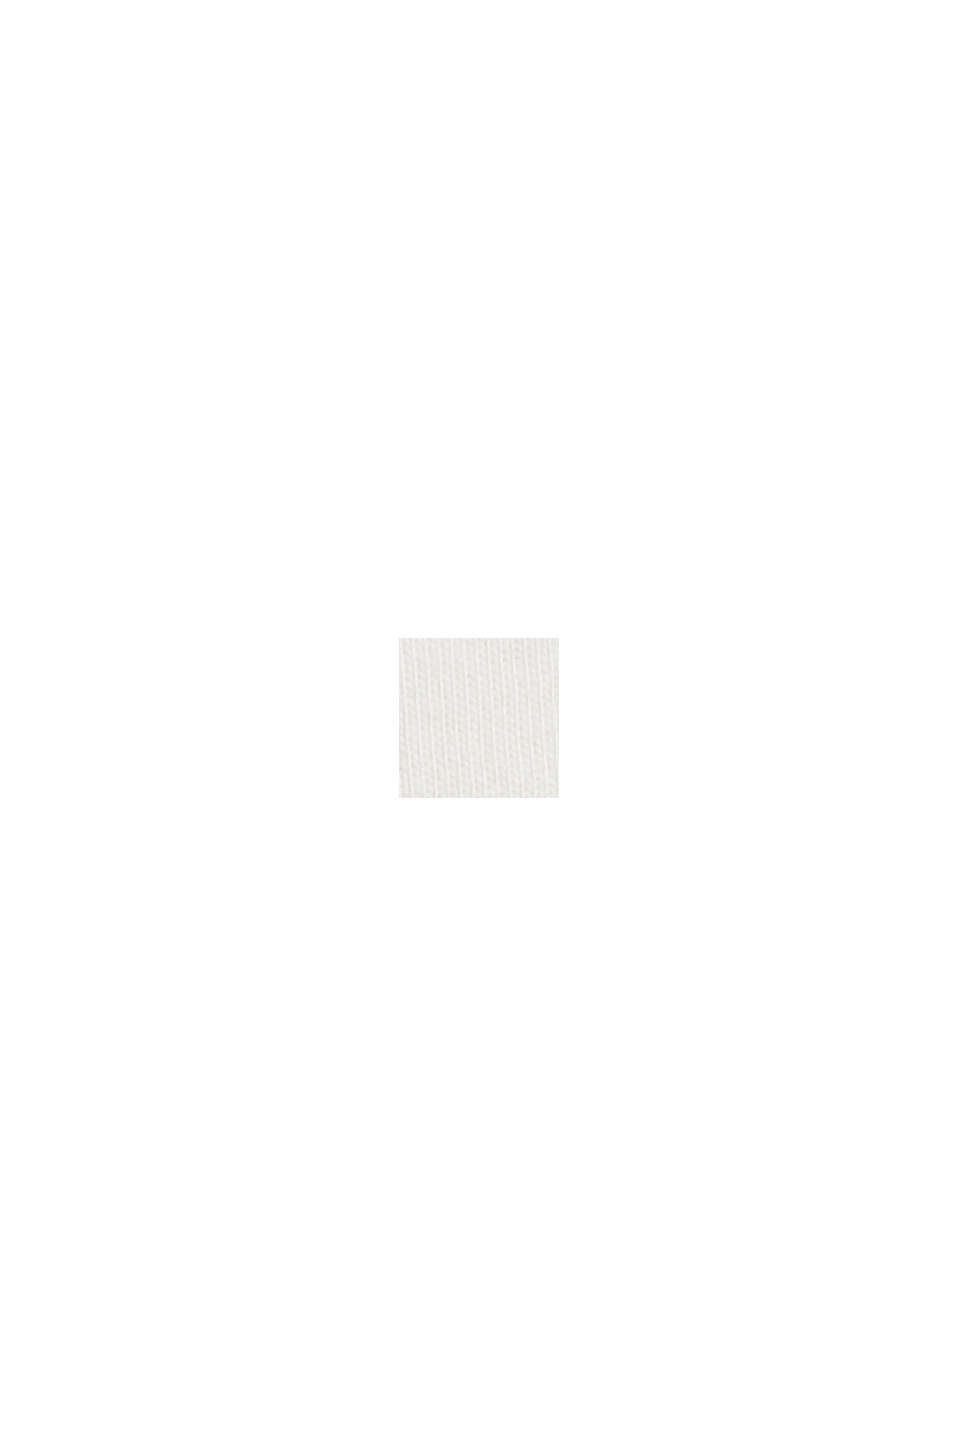 T-shirt van 100% organic cotton, OFF WHITE, swatch